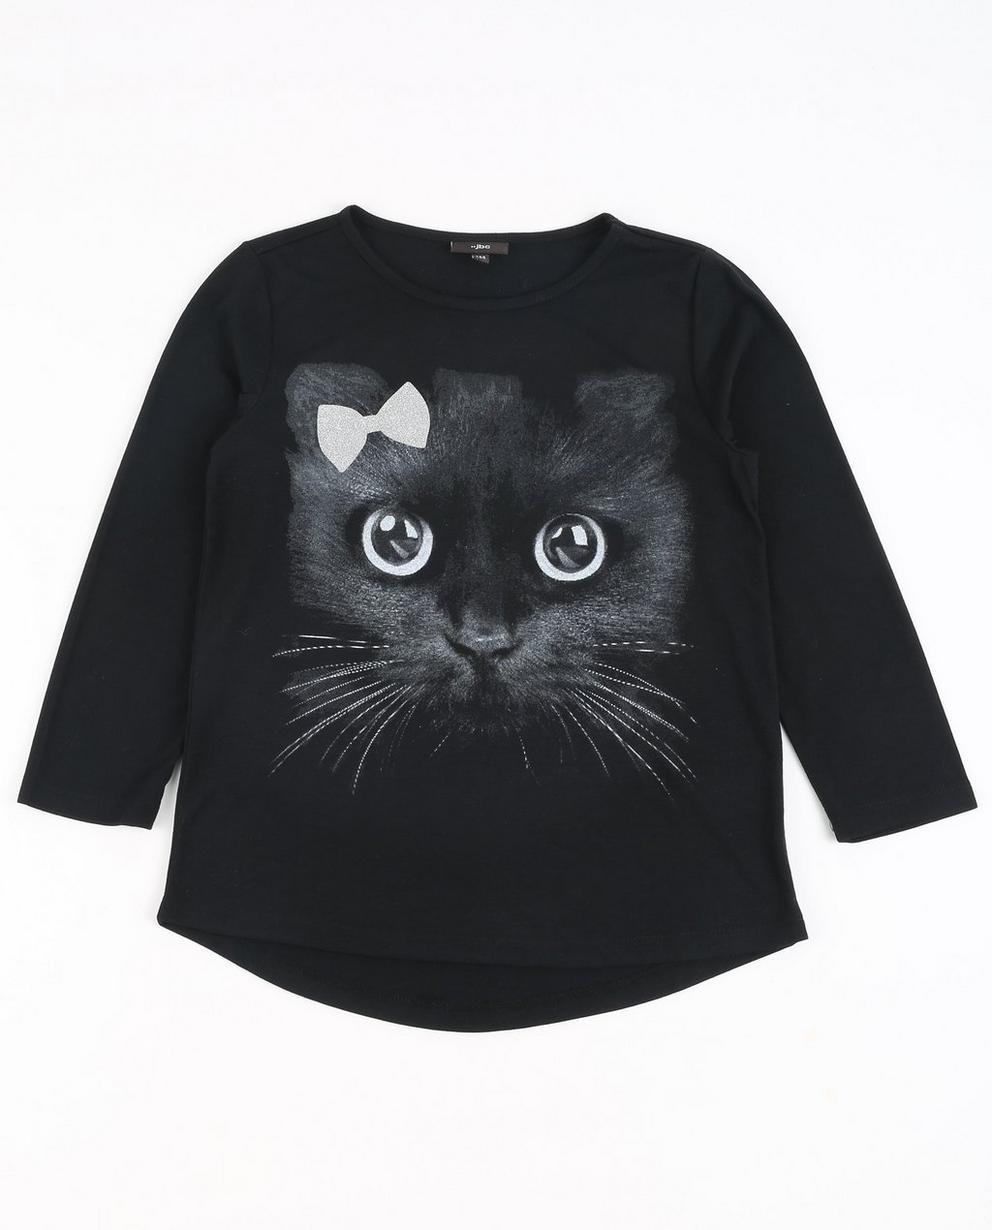 Zwarte longsleeve met kat - afgewerkt met glitter - JBC